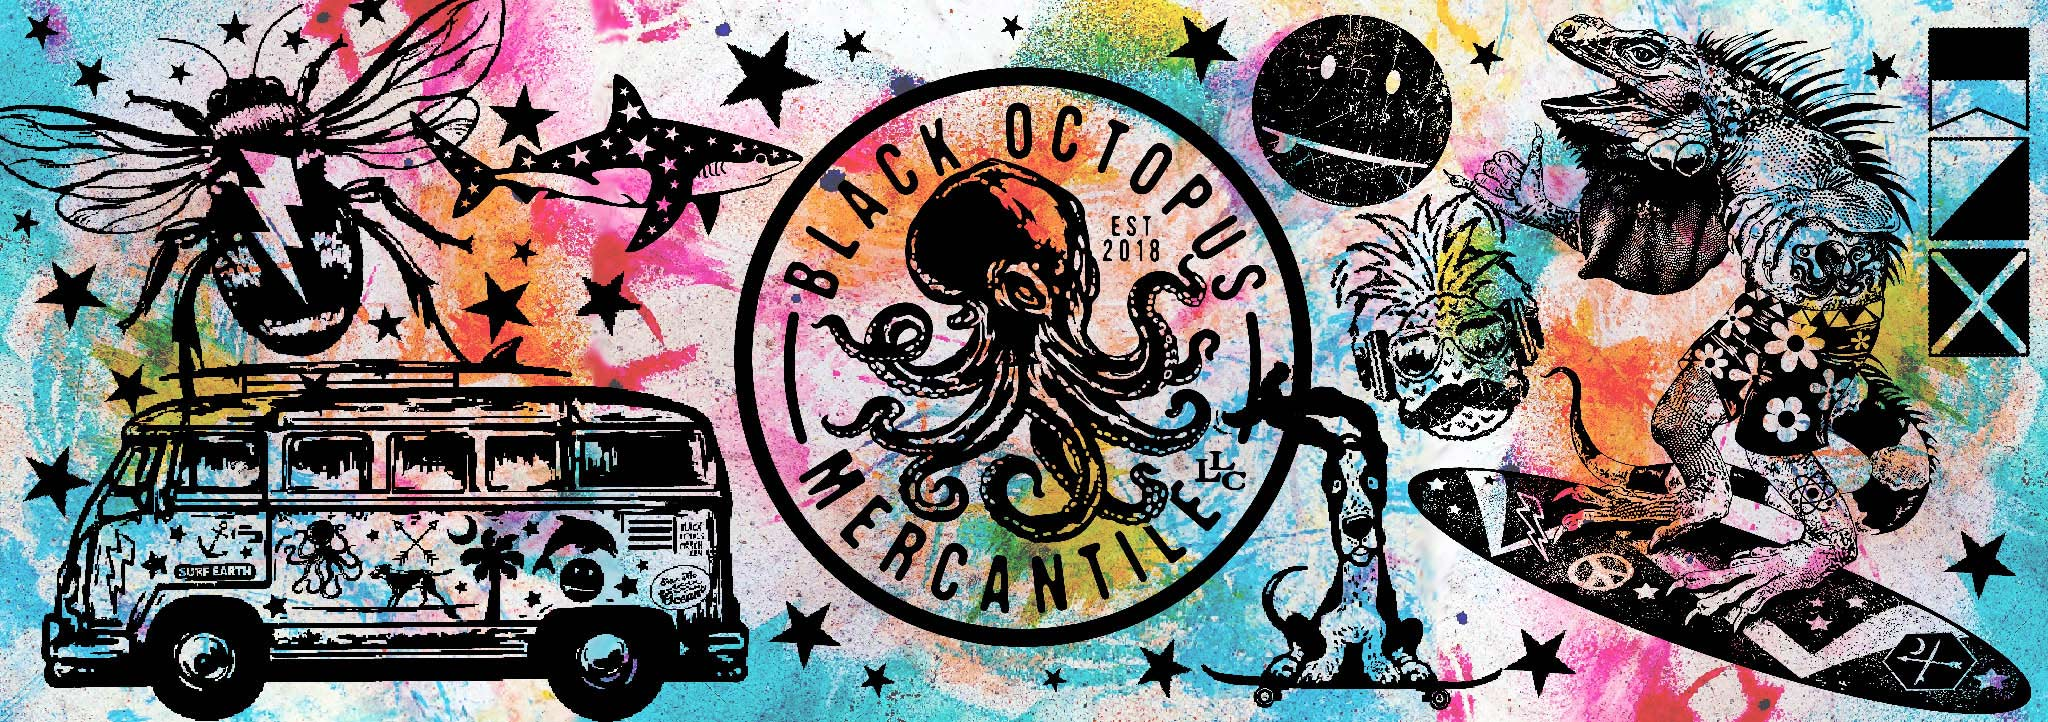 Black Octopus Mercantile